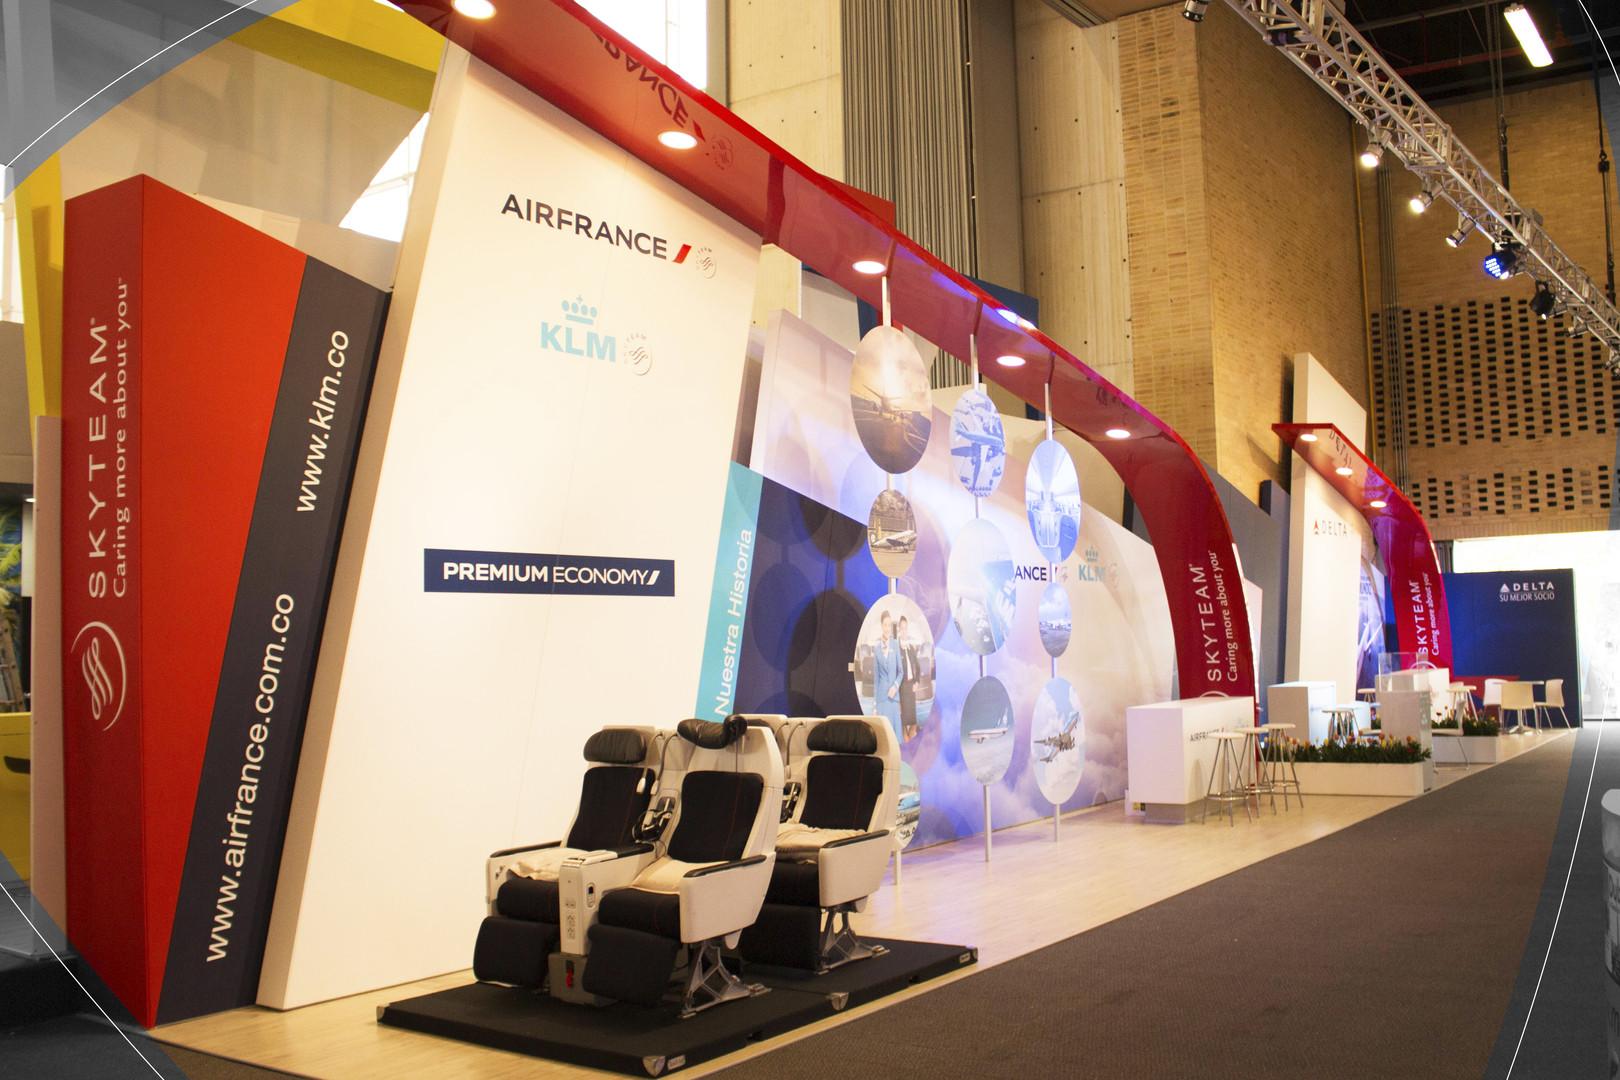 AirFrance IMG_9554.jpg